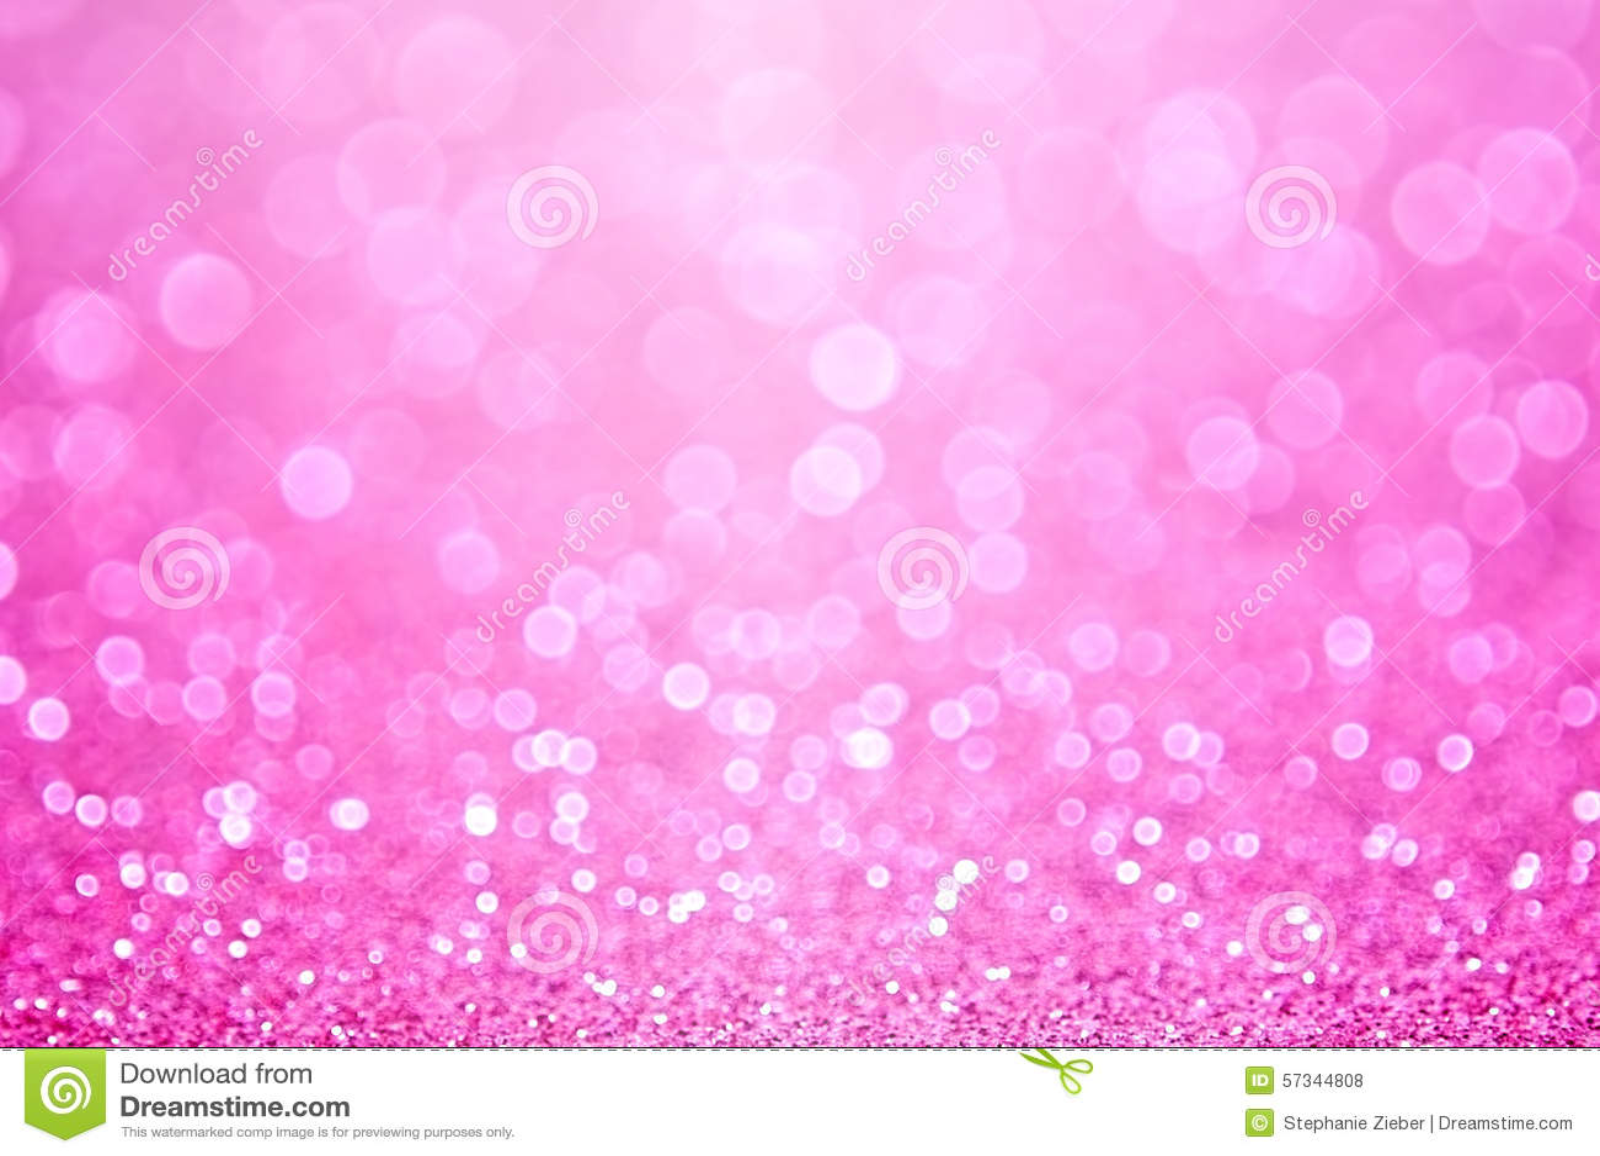 Happy Holidays Anime Girl Wallpaper 1920x1080 Pink Princess Baby Girl Birthday Background Stock Photo